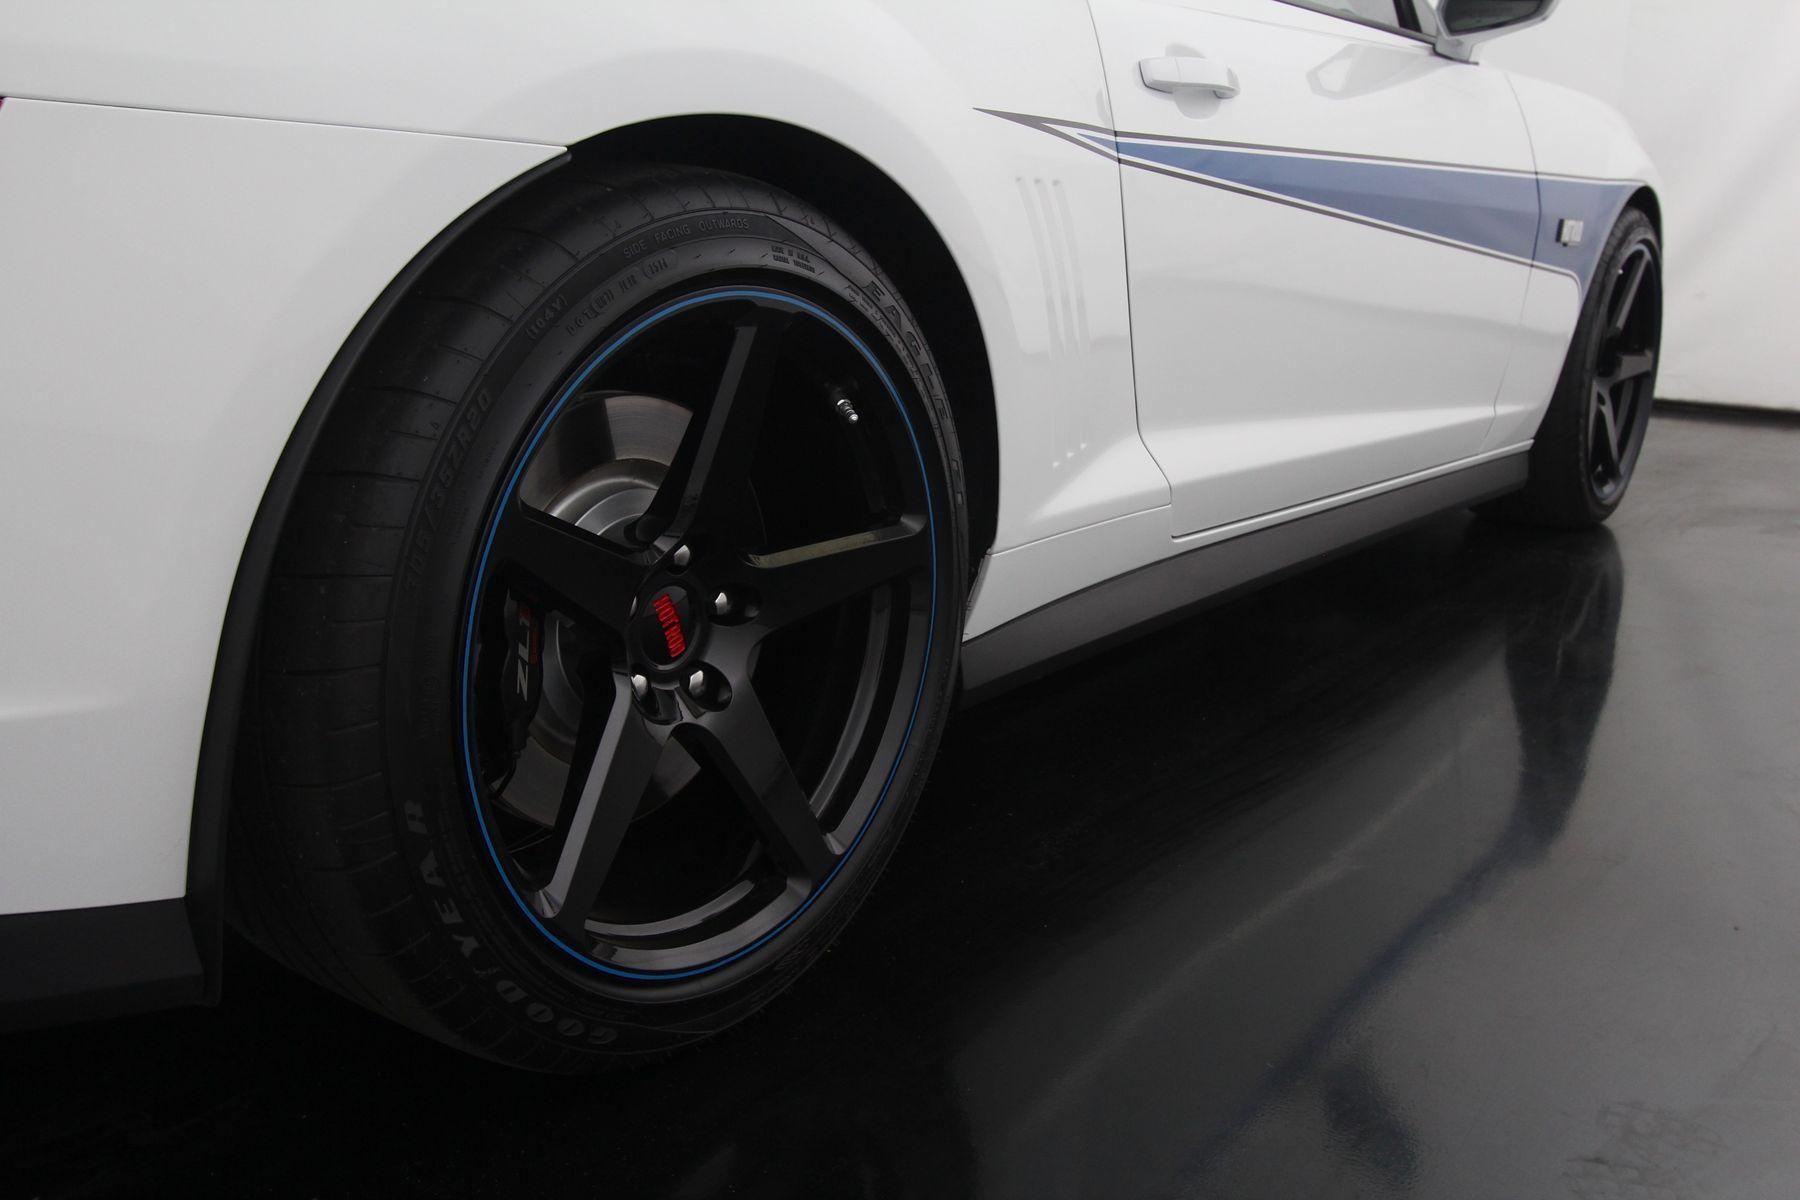 2014 Chevrolet Camaro   Julie Barker's HOT ROD Edition ZL1 Camaro on Forgeline One Piece Forged Monoblock CF1 Wheels